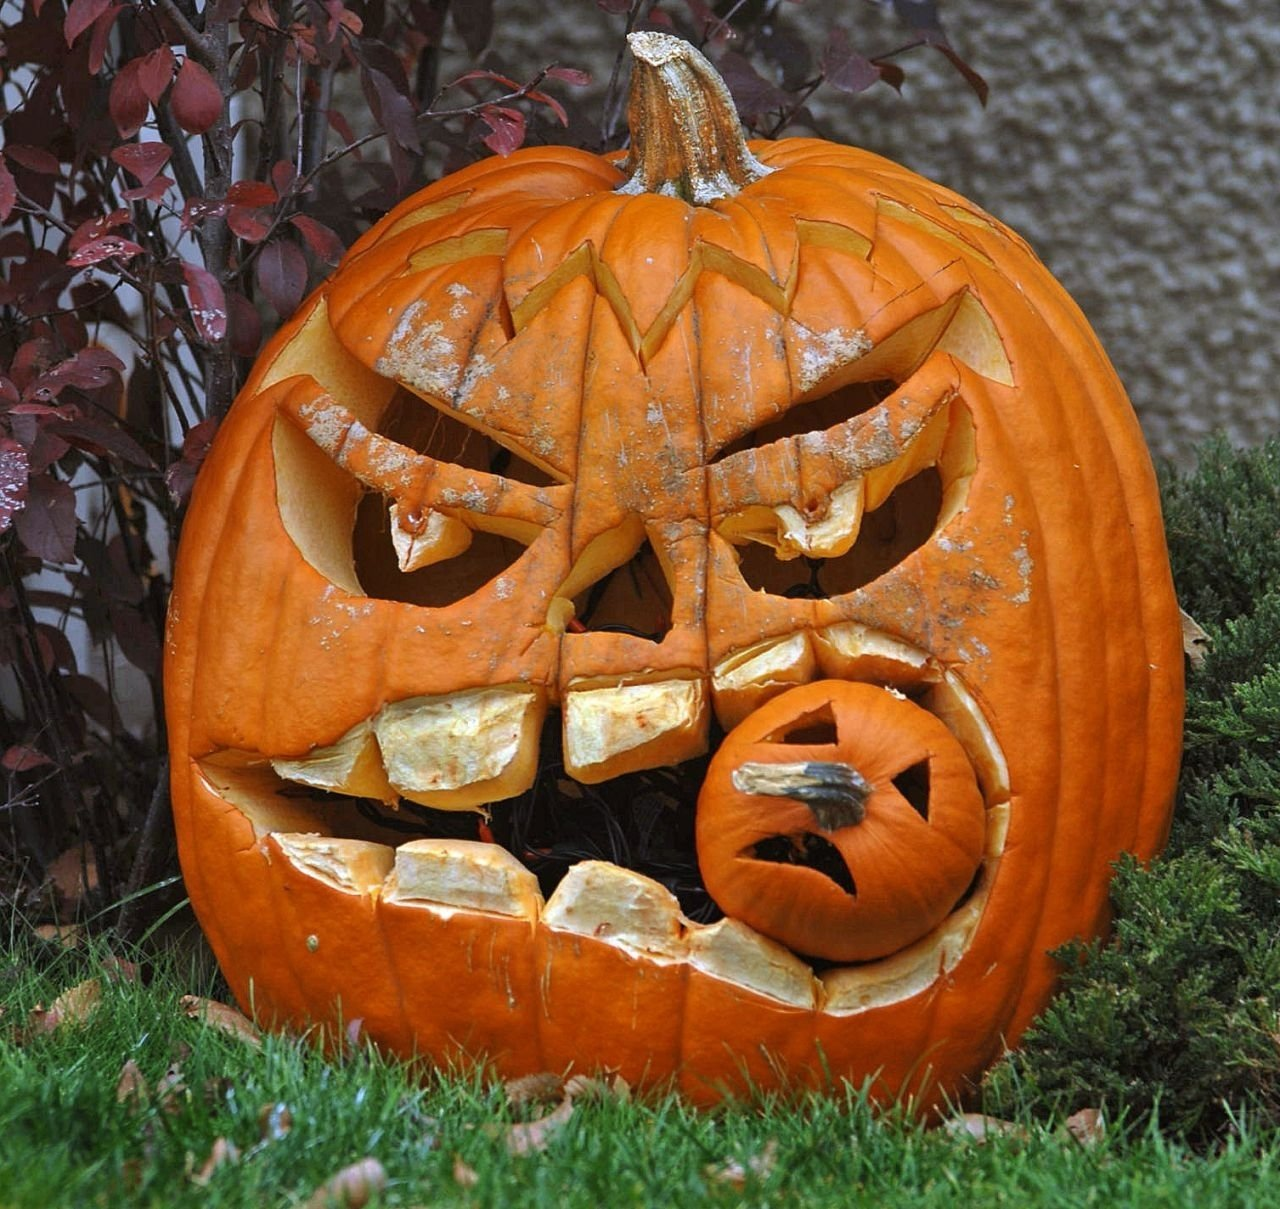 10 Best Cute Couple Pumpkin Carving Ideas decoration minimalist funny large teeth couple pumpkin carving 2020